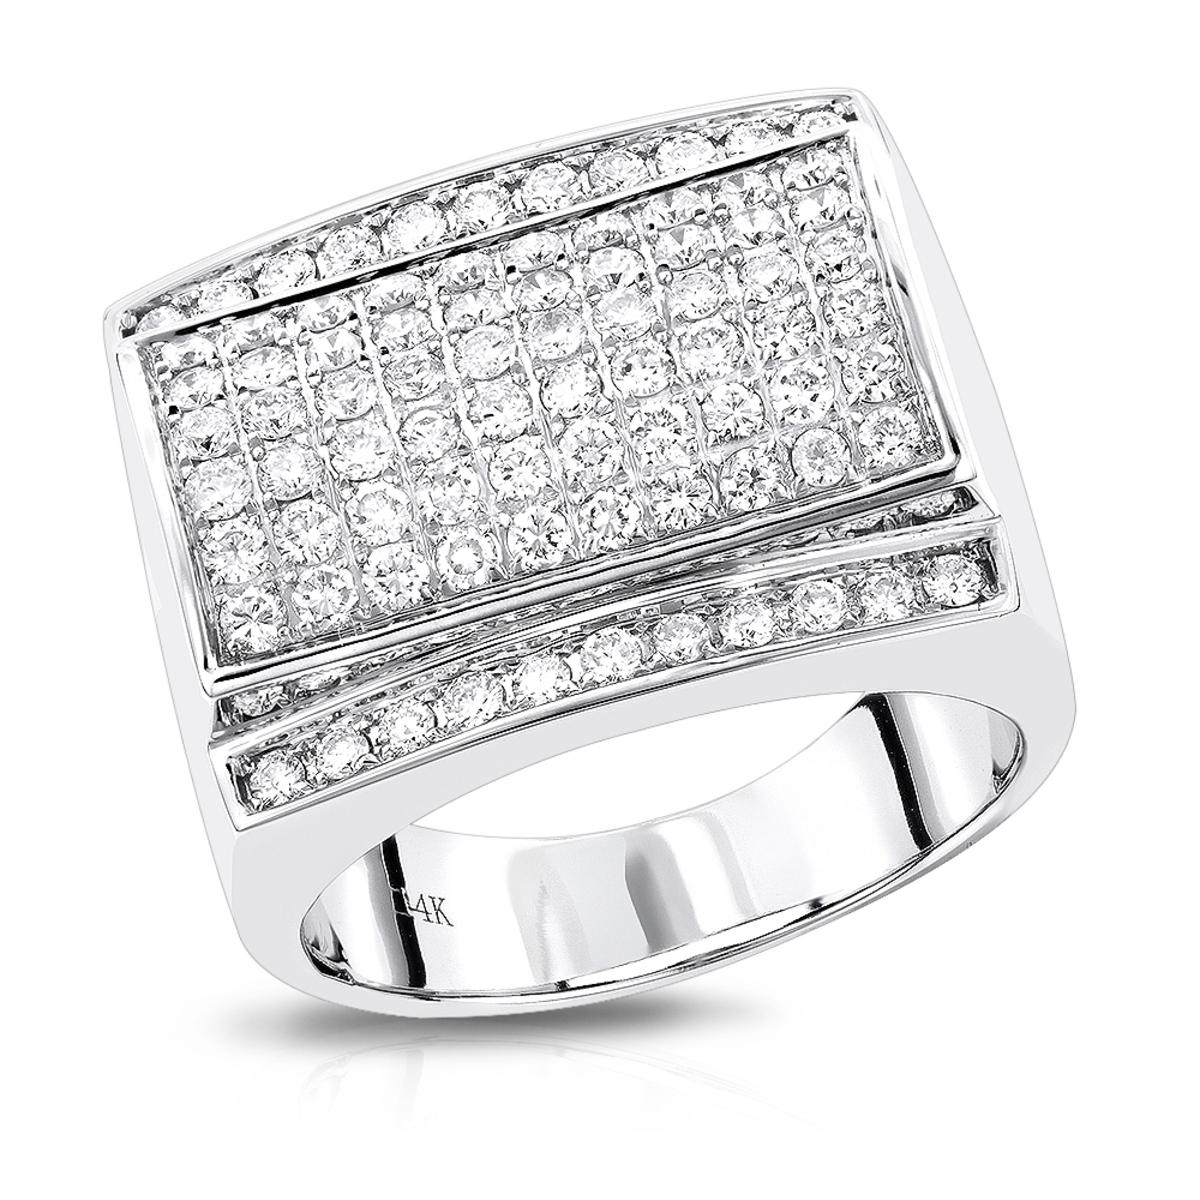 Mens Diamond Ring by Luxurman in 14K Gold 1.8ct